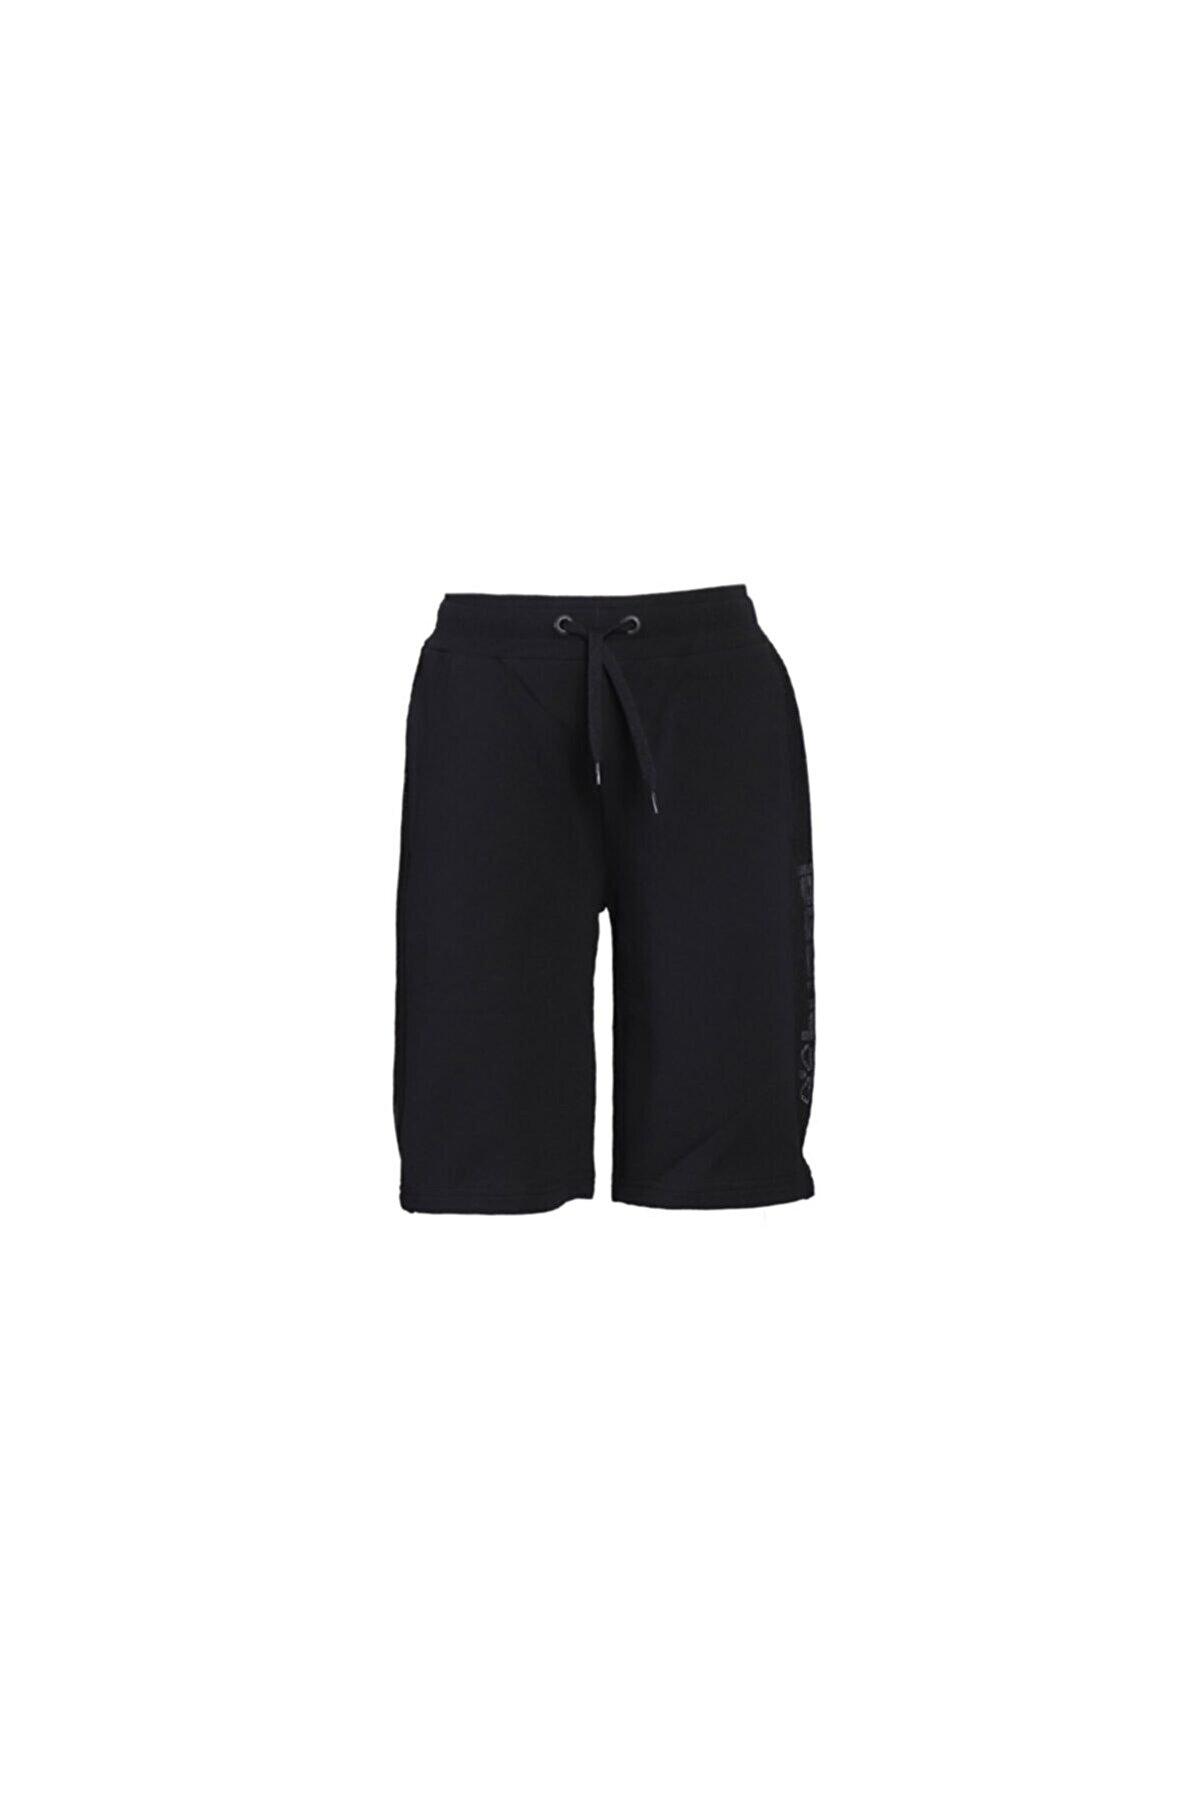 HUMMEL Sherıdan Çocuk Shorts